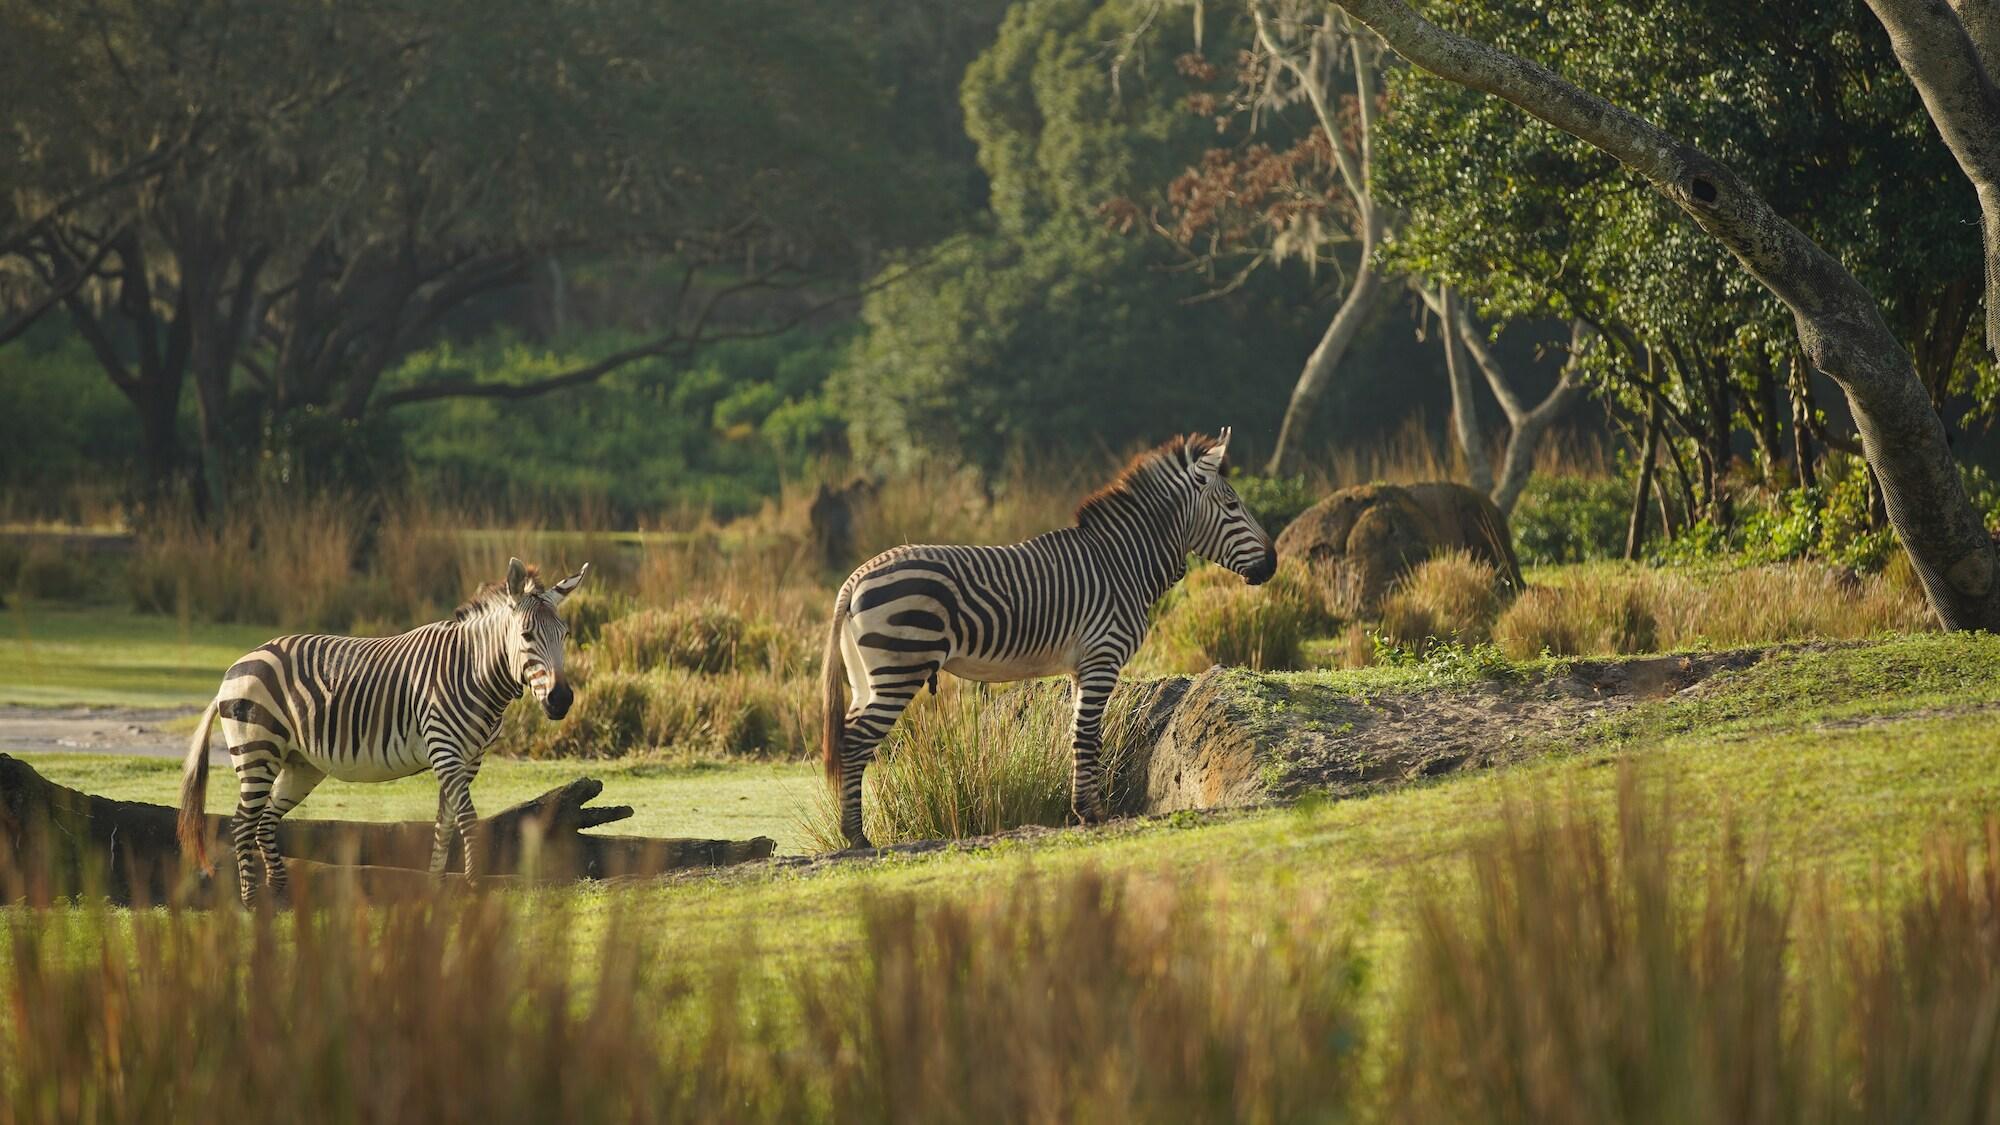 Hartmann's Mountain Zebras on the savanna at Kilimanjaro Safari. (Disney)